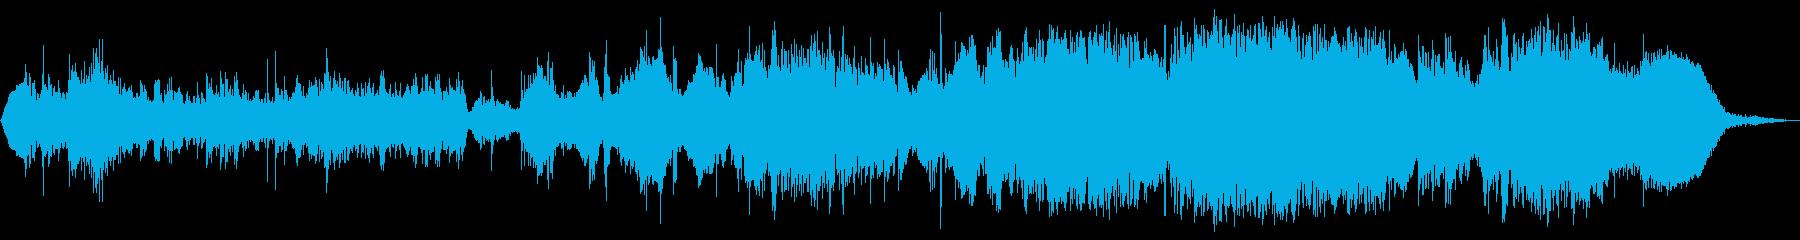 Groovy Space 3の再生済みの波形